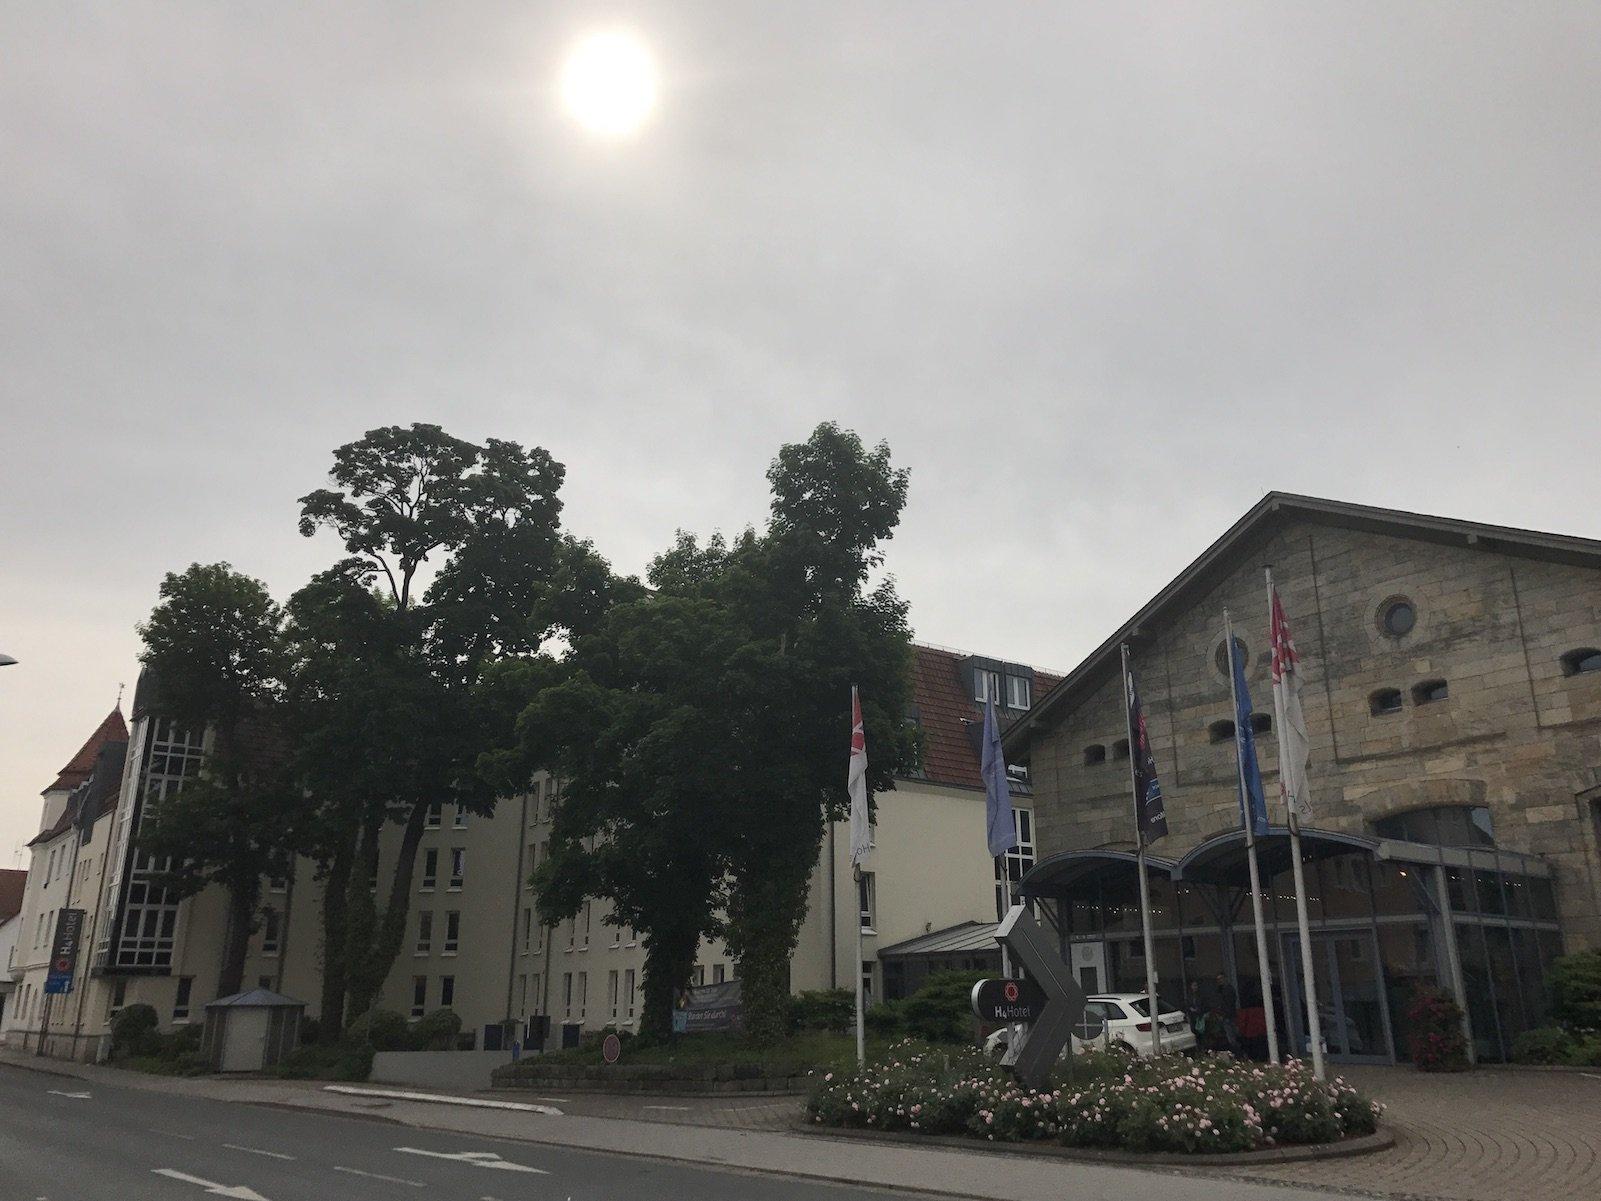 Eingangsbereich des H4 Hotels Residenzschloss Bayreuth